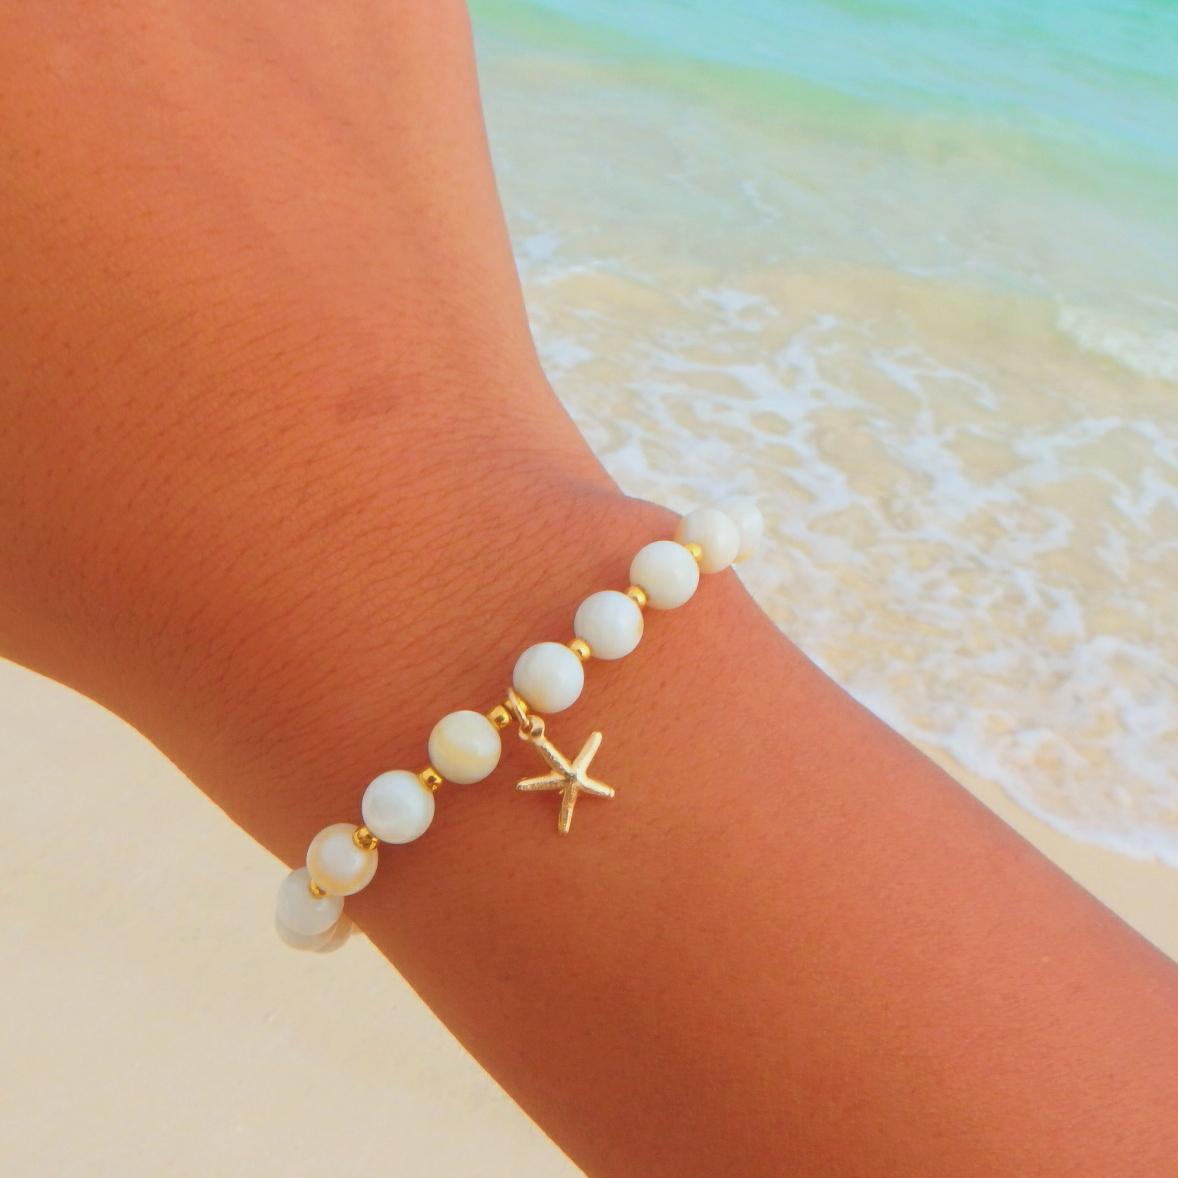 Stone Ruber Bracelet